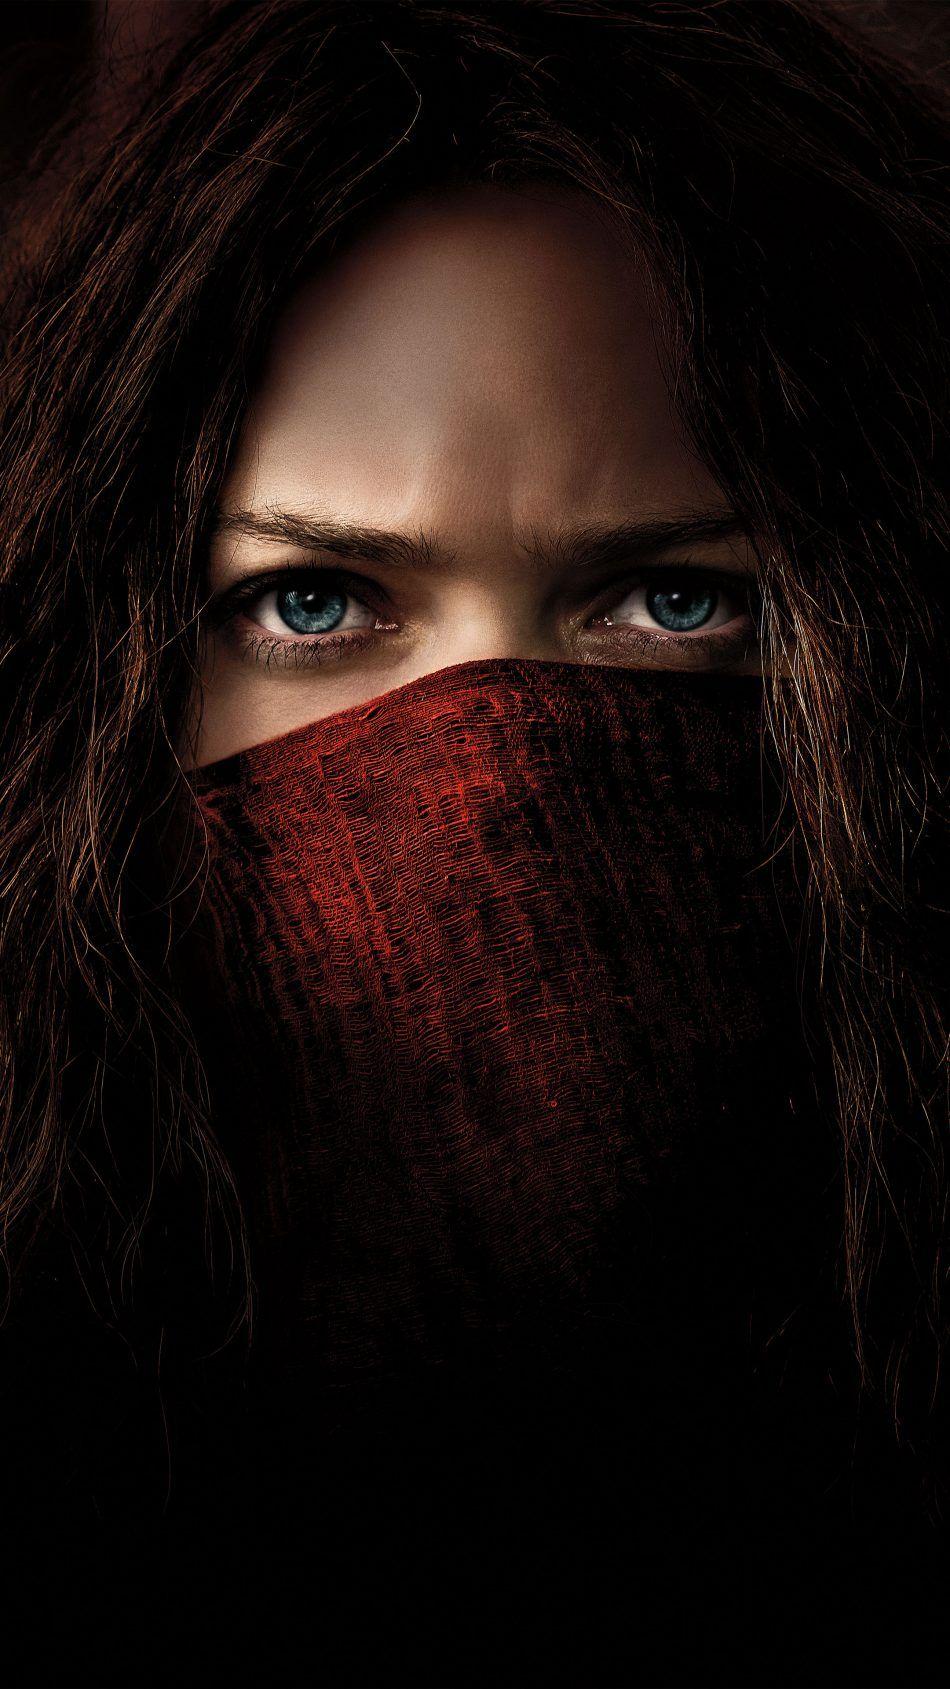 Hera Hilmar In Mortal Engines 2018 Hilmar Mortal Engines Mobile Wallpaper